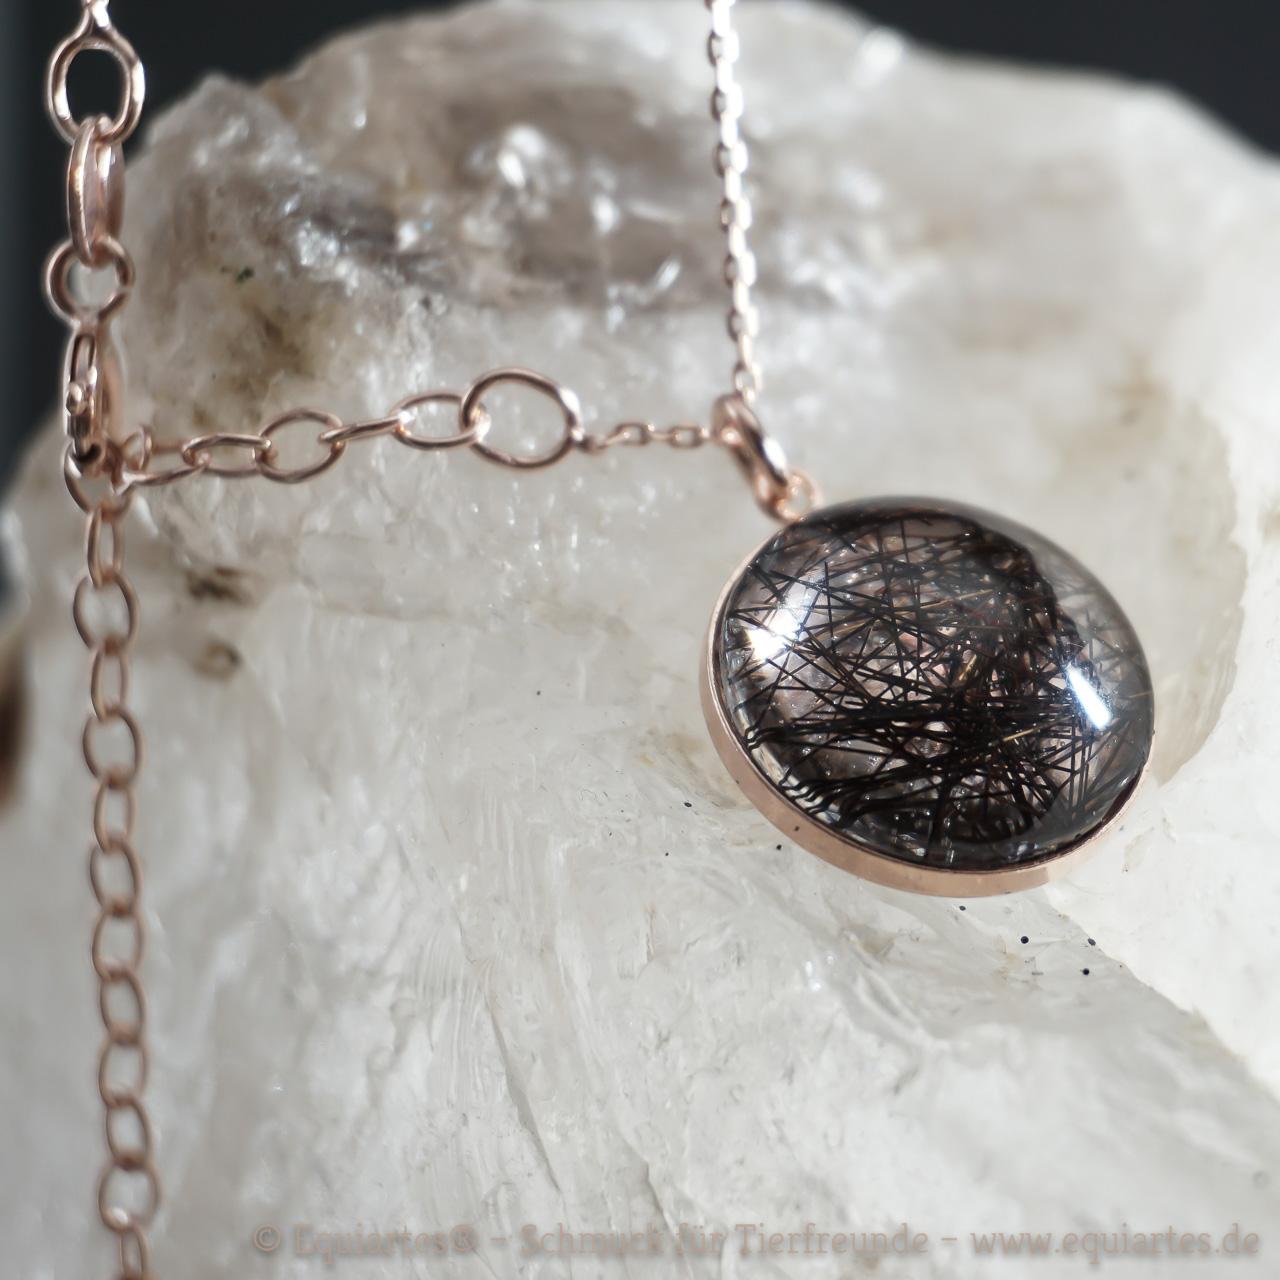 Tierhaarschmuck Medaillon flach mit Cabochon - rosévergoldet Sterlingsilber - Merkur